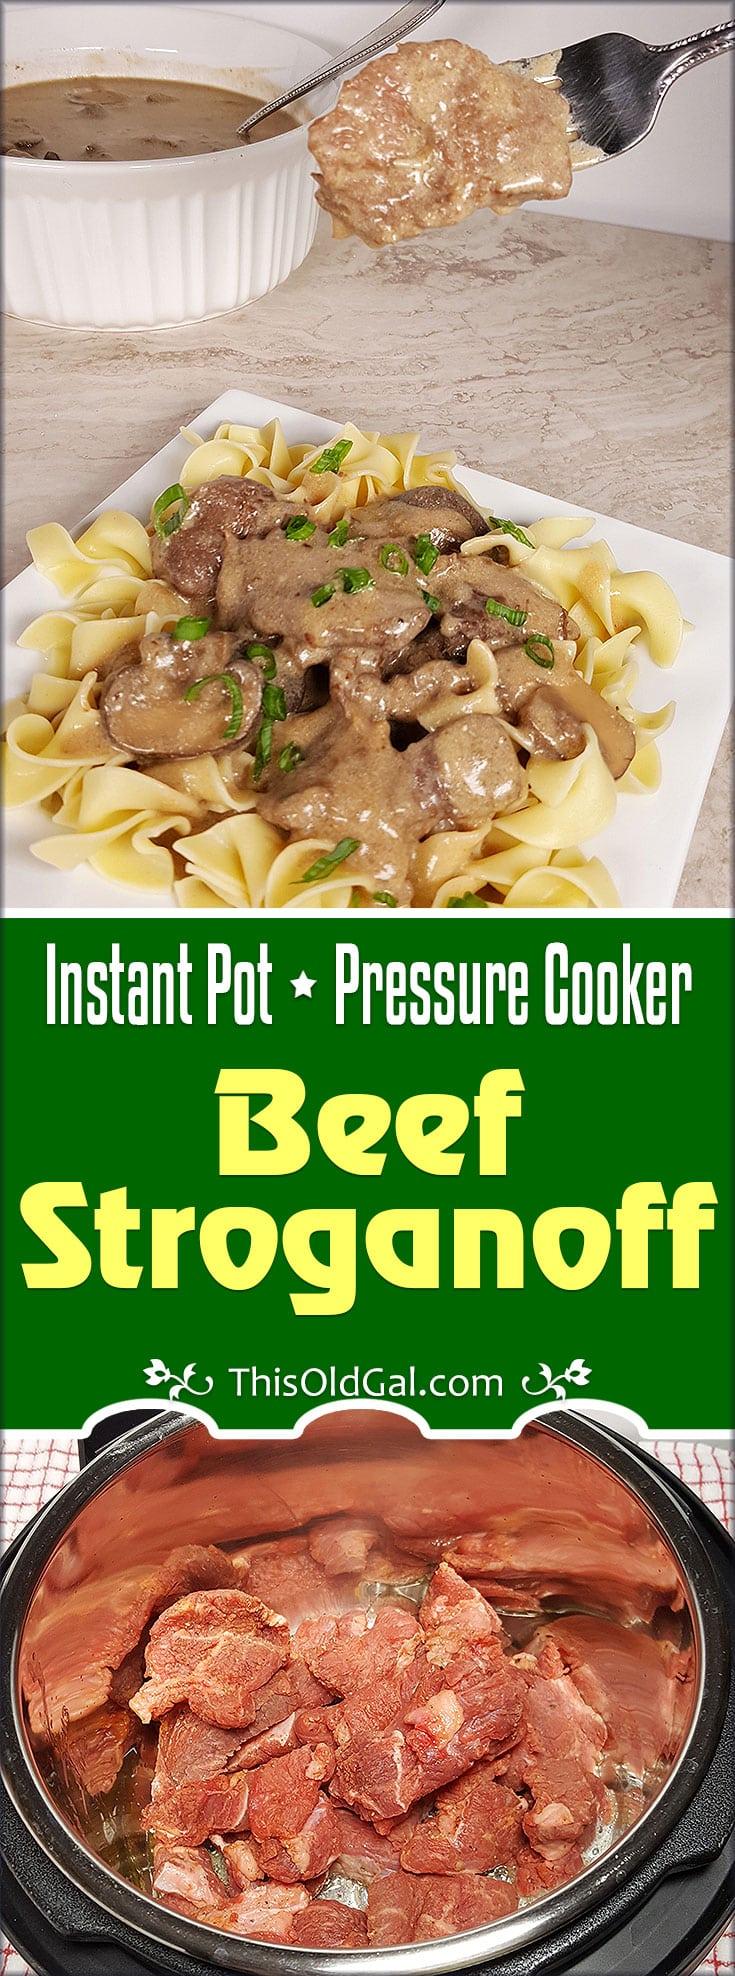 Creamy Instant Pot Beef Stroganoff